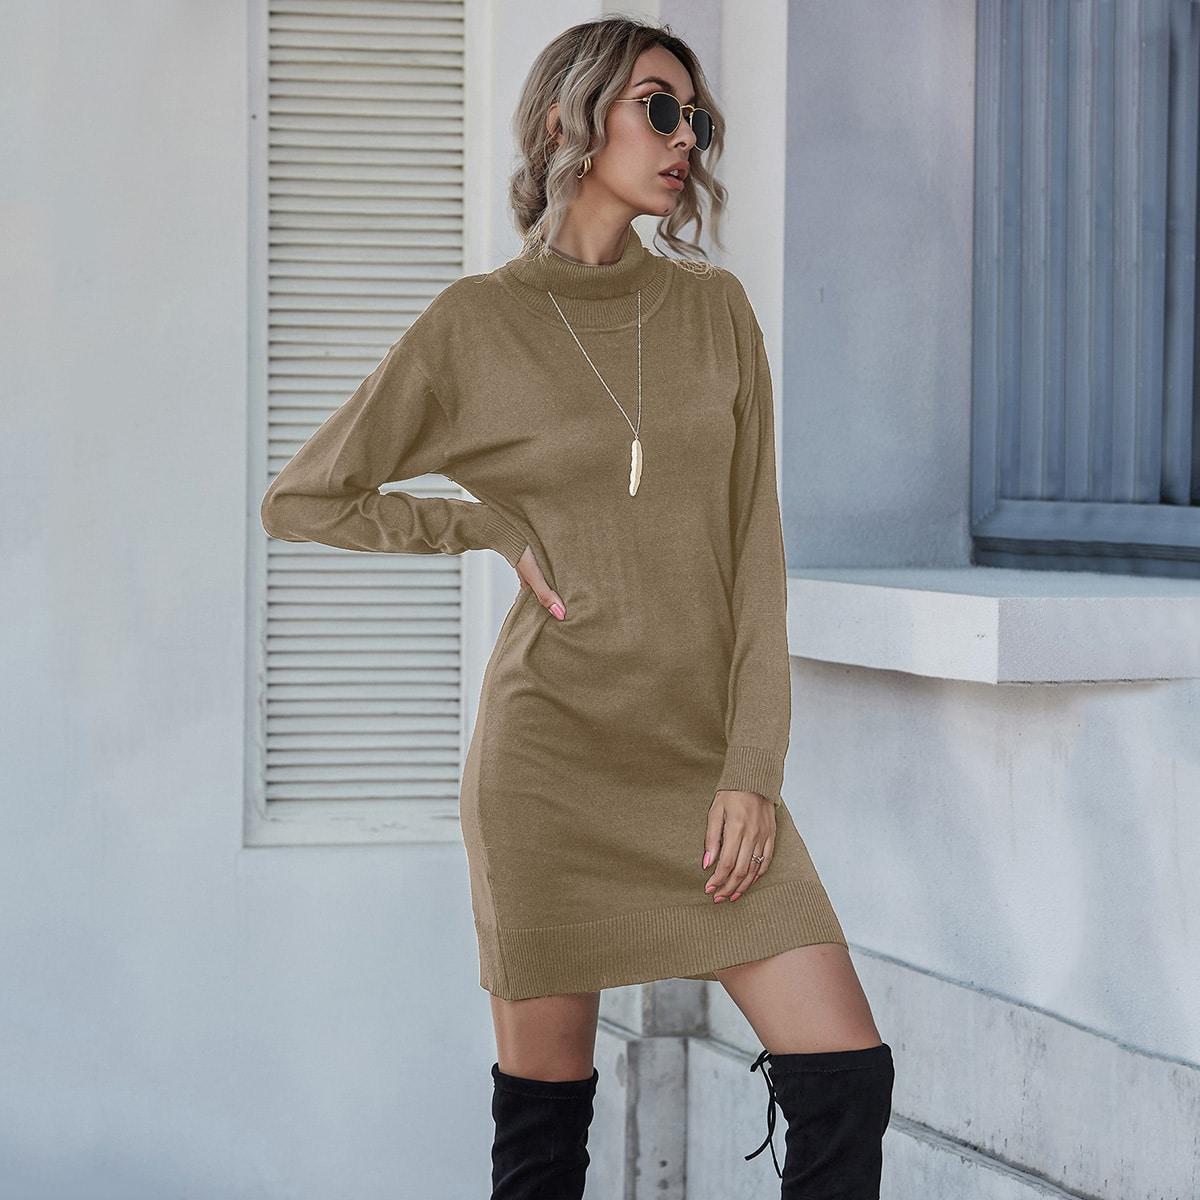 shein Casual Vlak Gebreide jurk